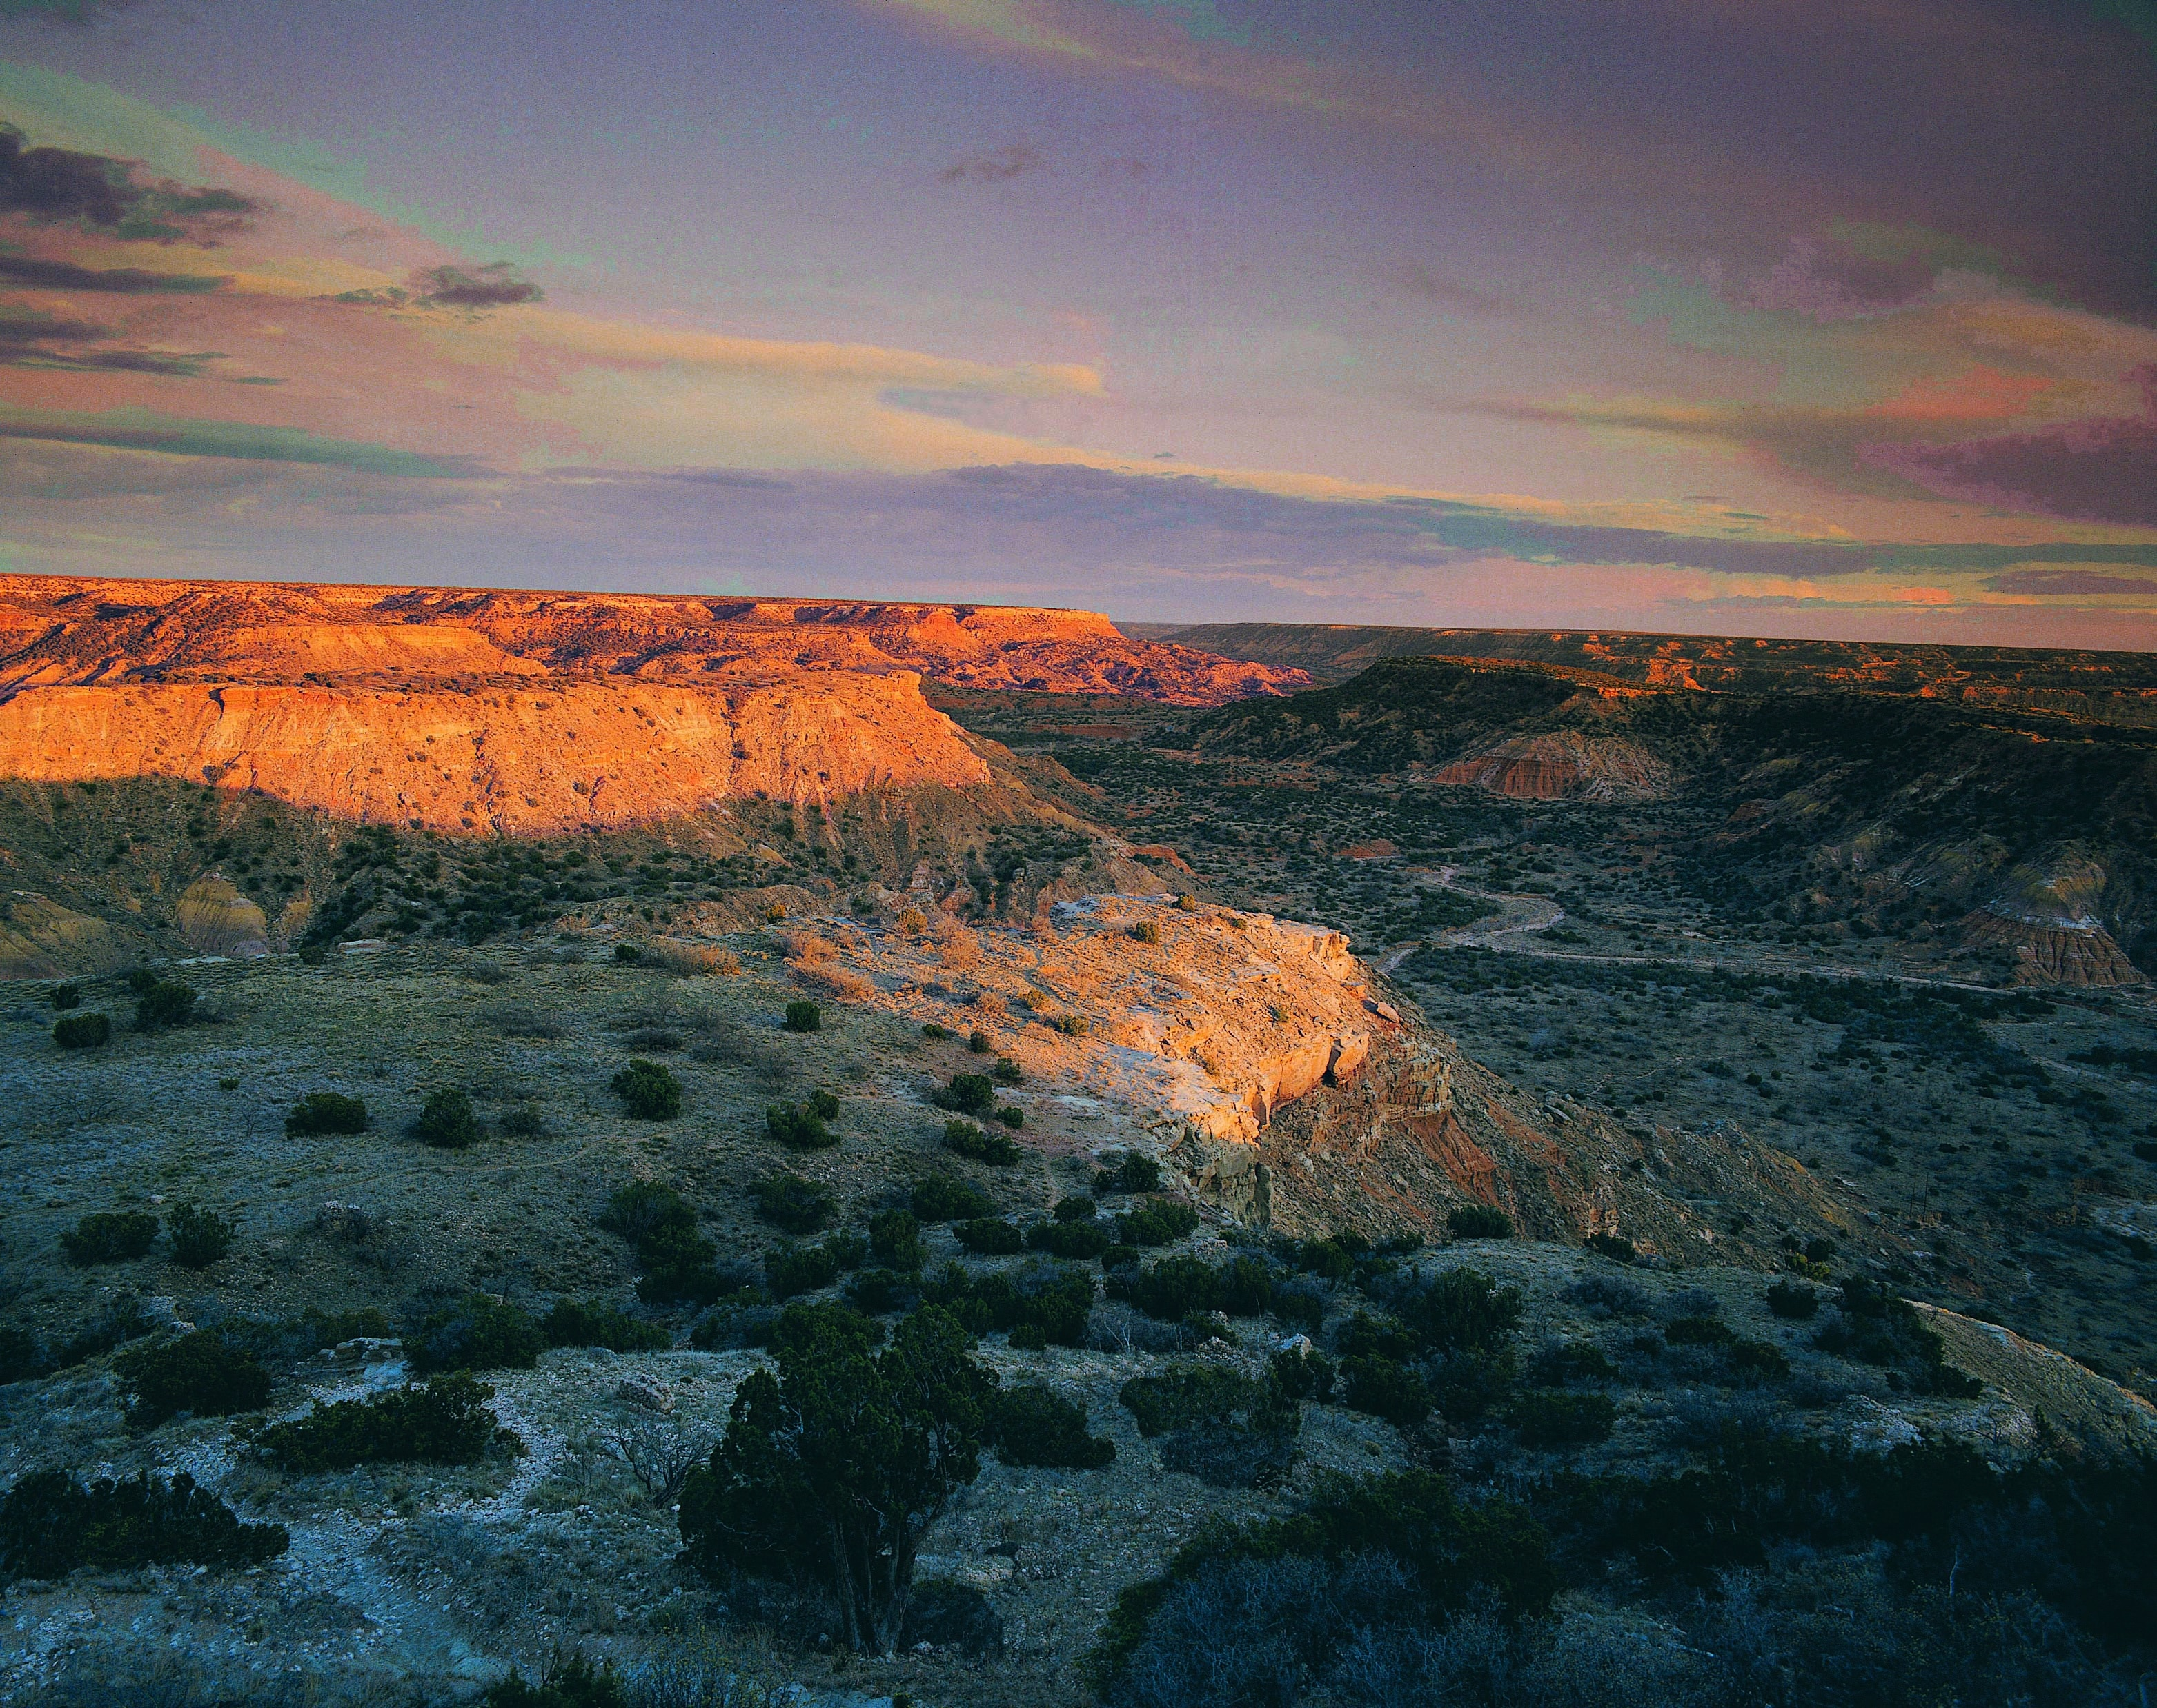 Palo Duro Canyon, Amarillo, Texas, United States of America